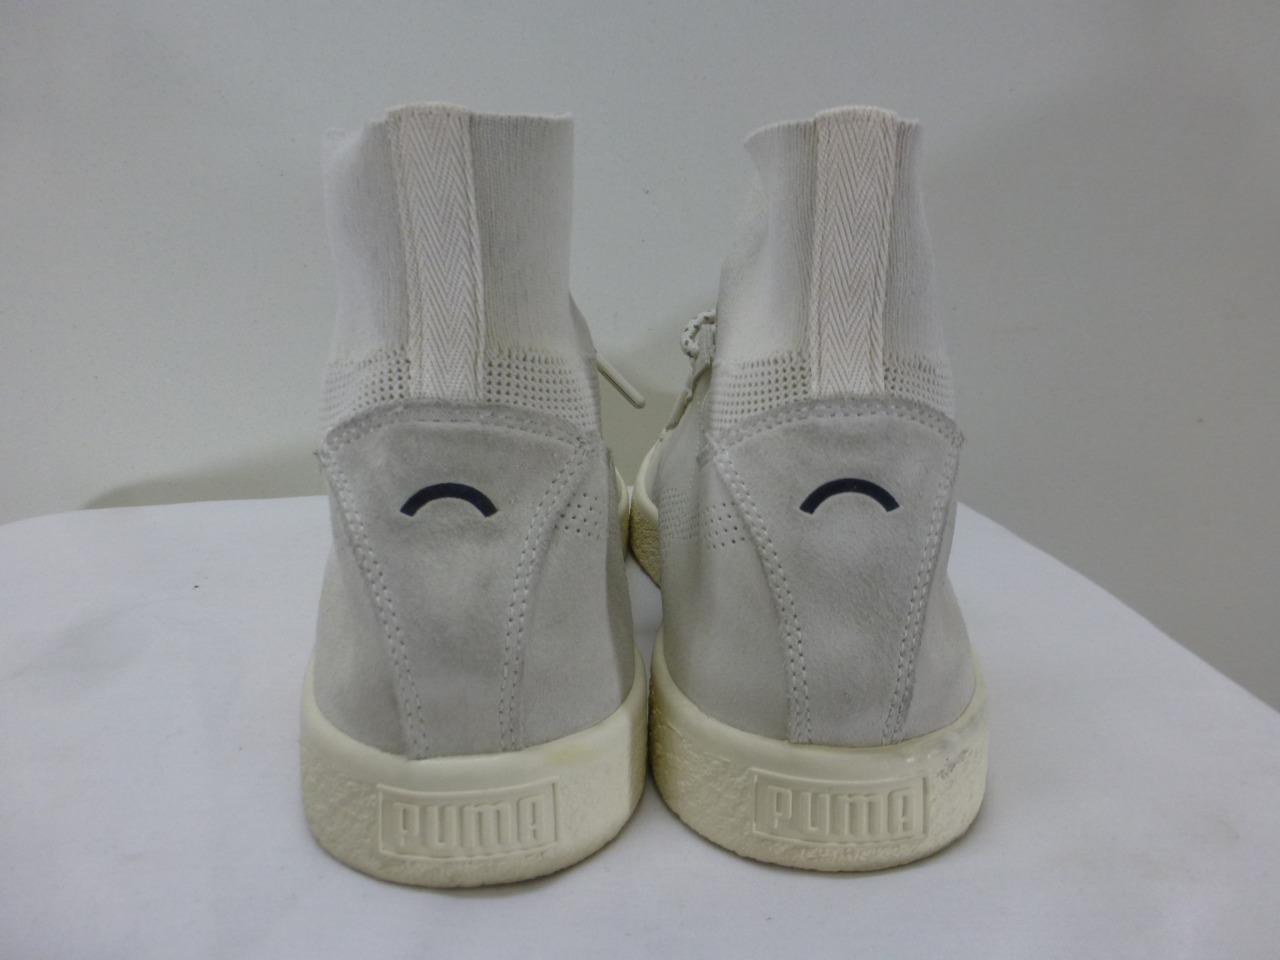 PUMA Clyde White basketball Sock 363670-02 hi top basketball White Scarpe scarpe da ginnastica Uomo sz 12 46 83f084